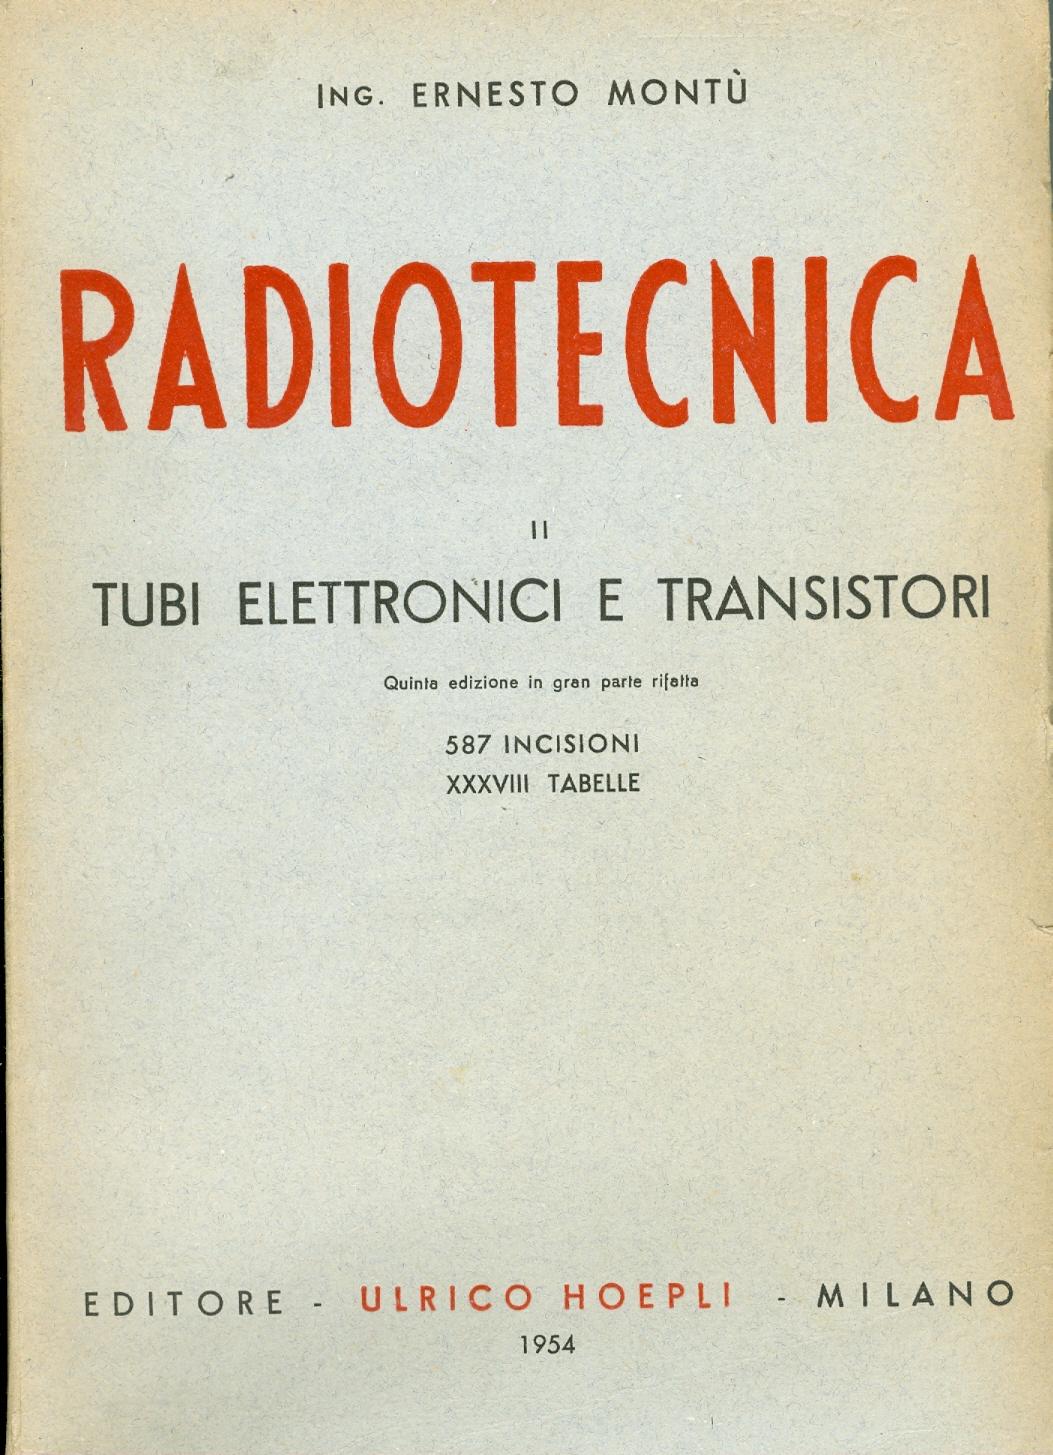 Radiotecnica - Vol. II